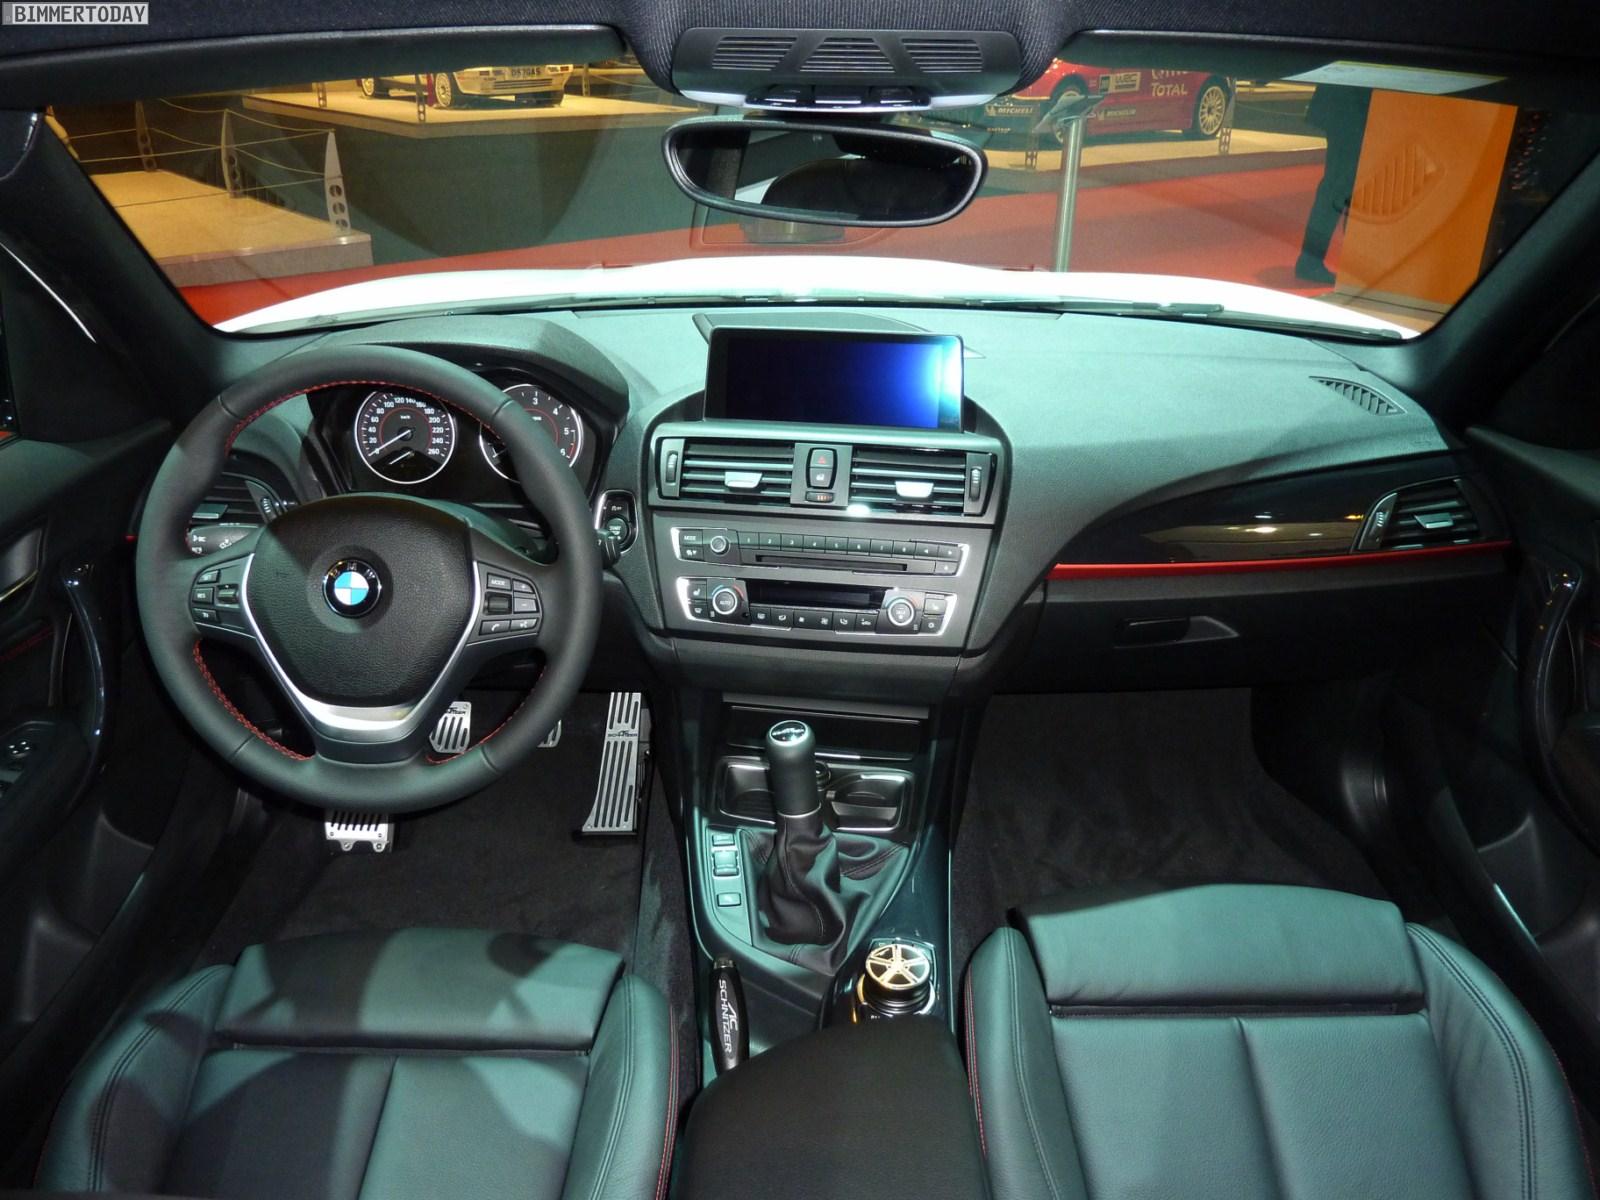 BMW 1er F20 ACS1 AC Schnitzer Essen Motor Show 2011 Innenraum 03